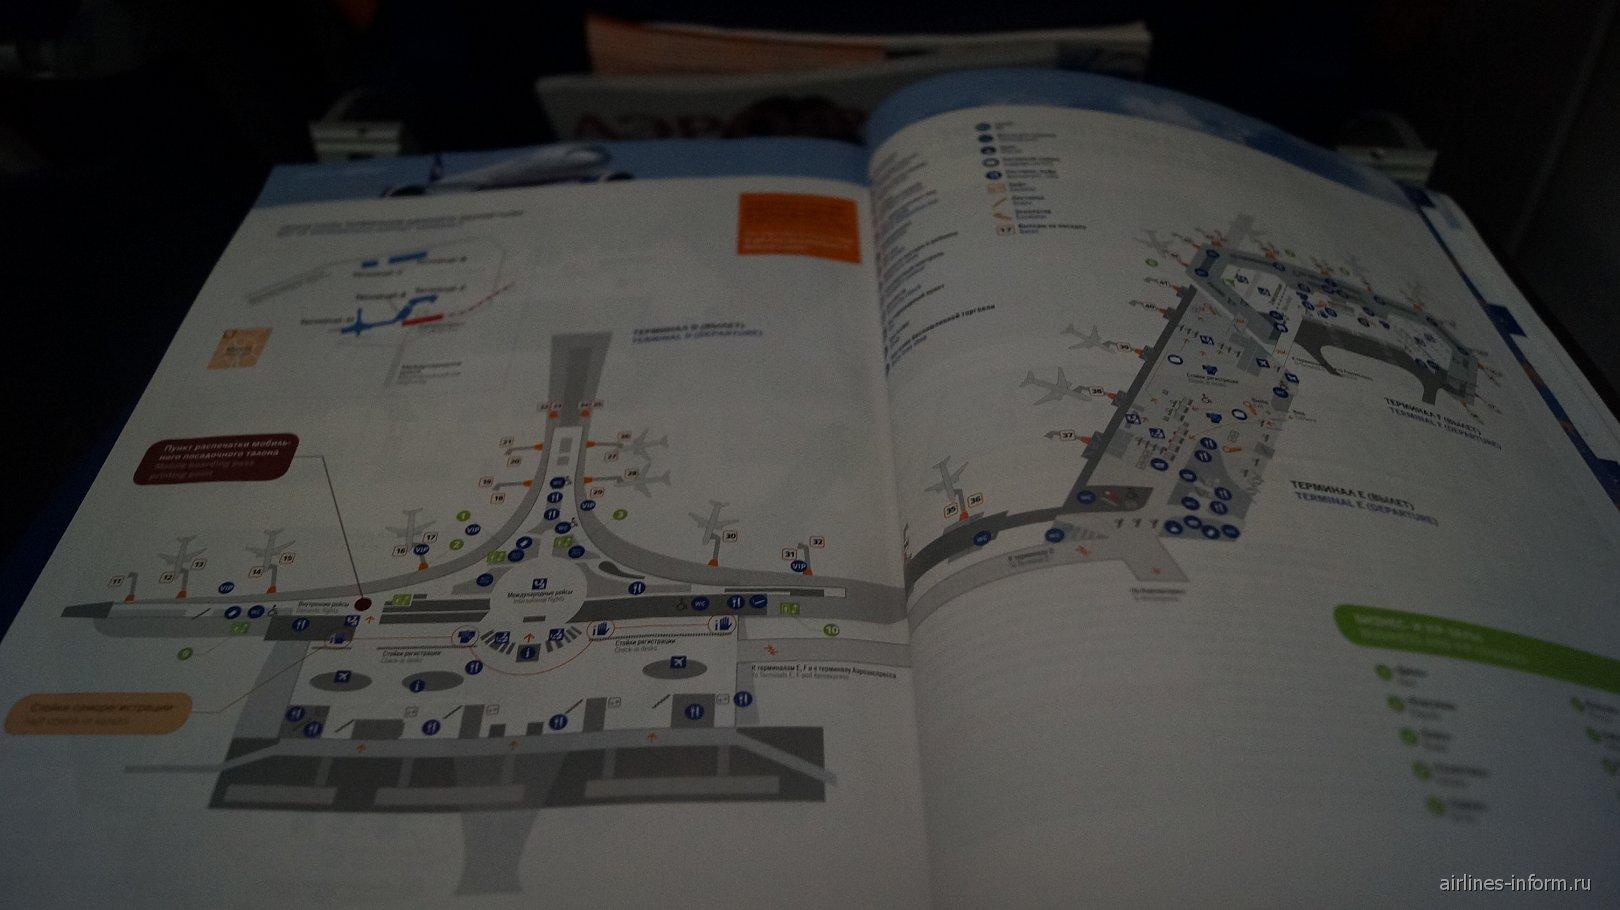 Журналы для пассажиров Аэрофлота